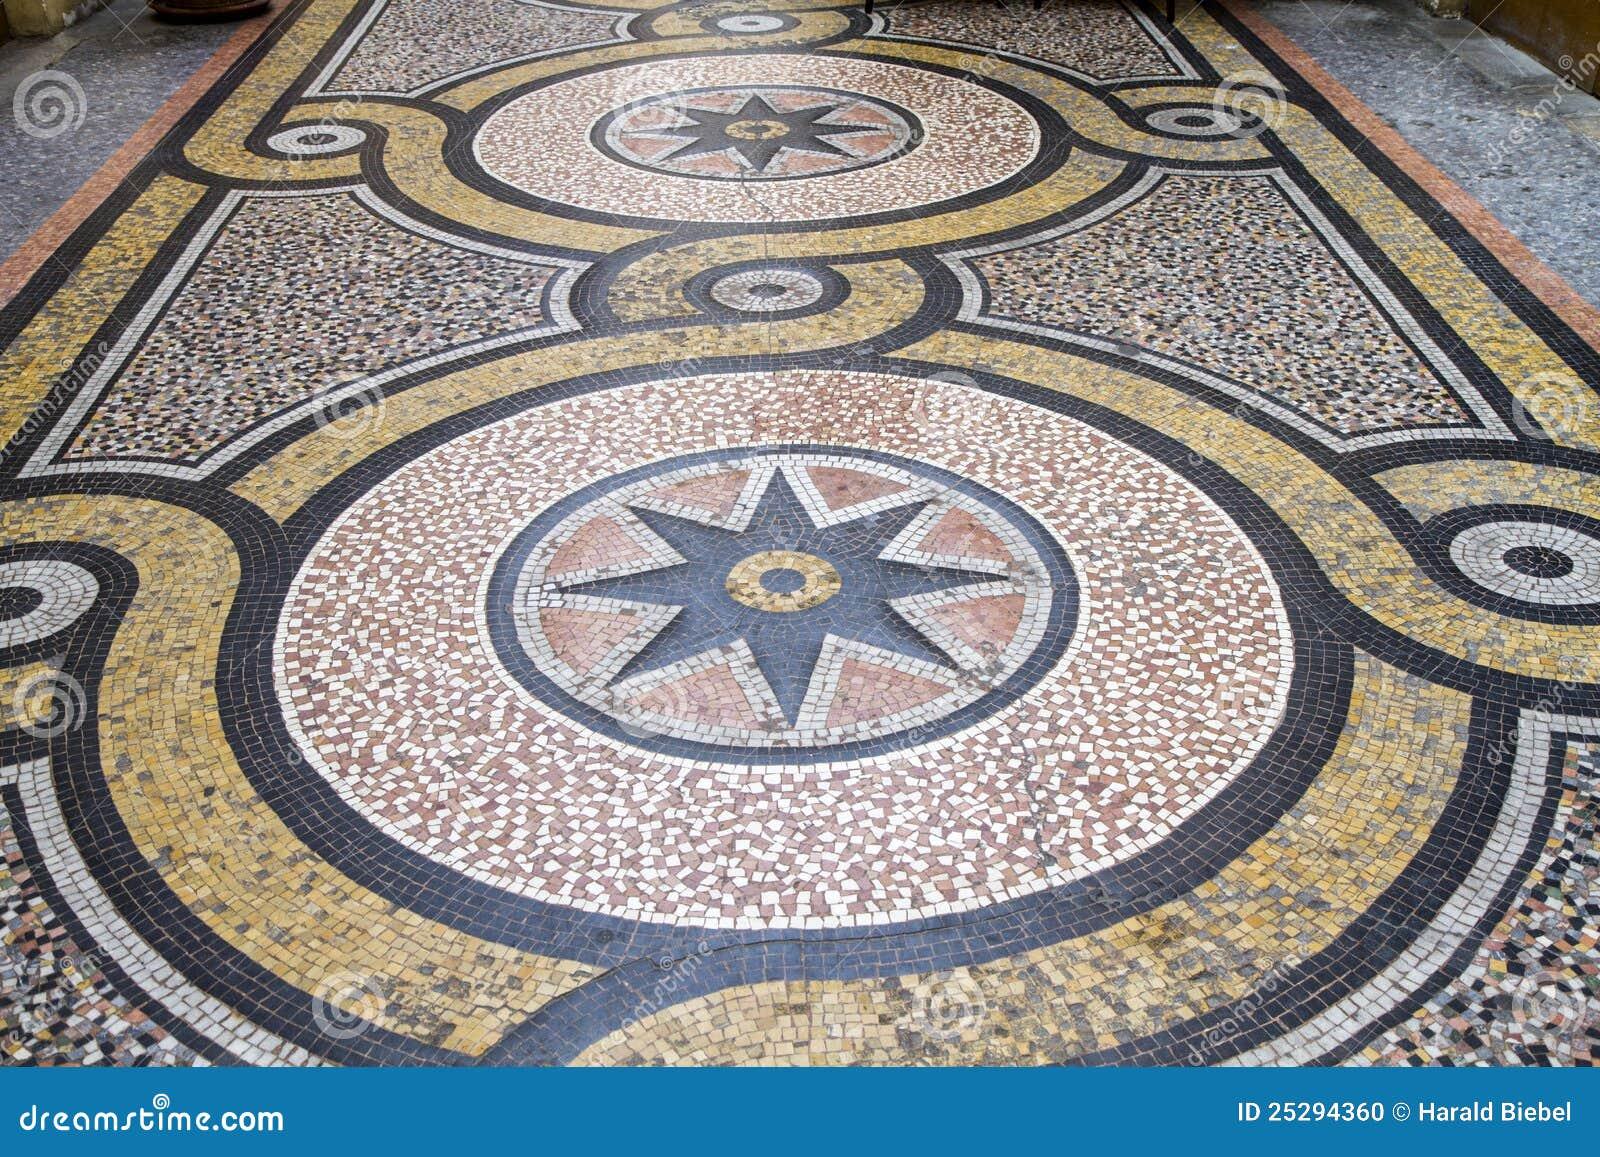 Pavimento di mosaico storico parigi fotografia stock for Pavimento con mosaico